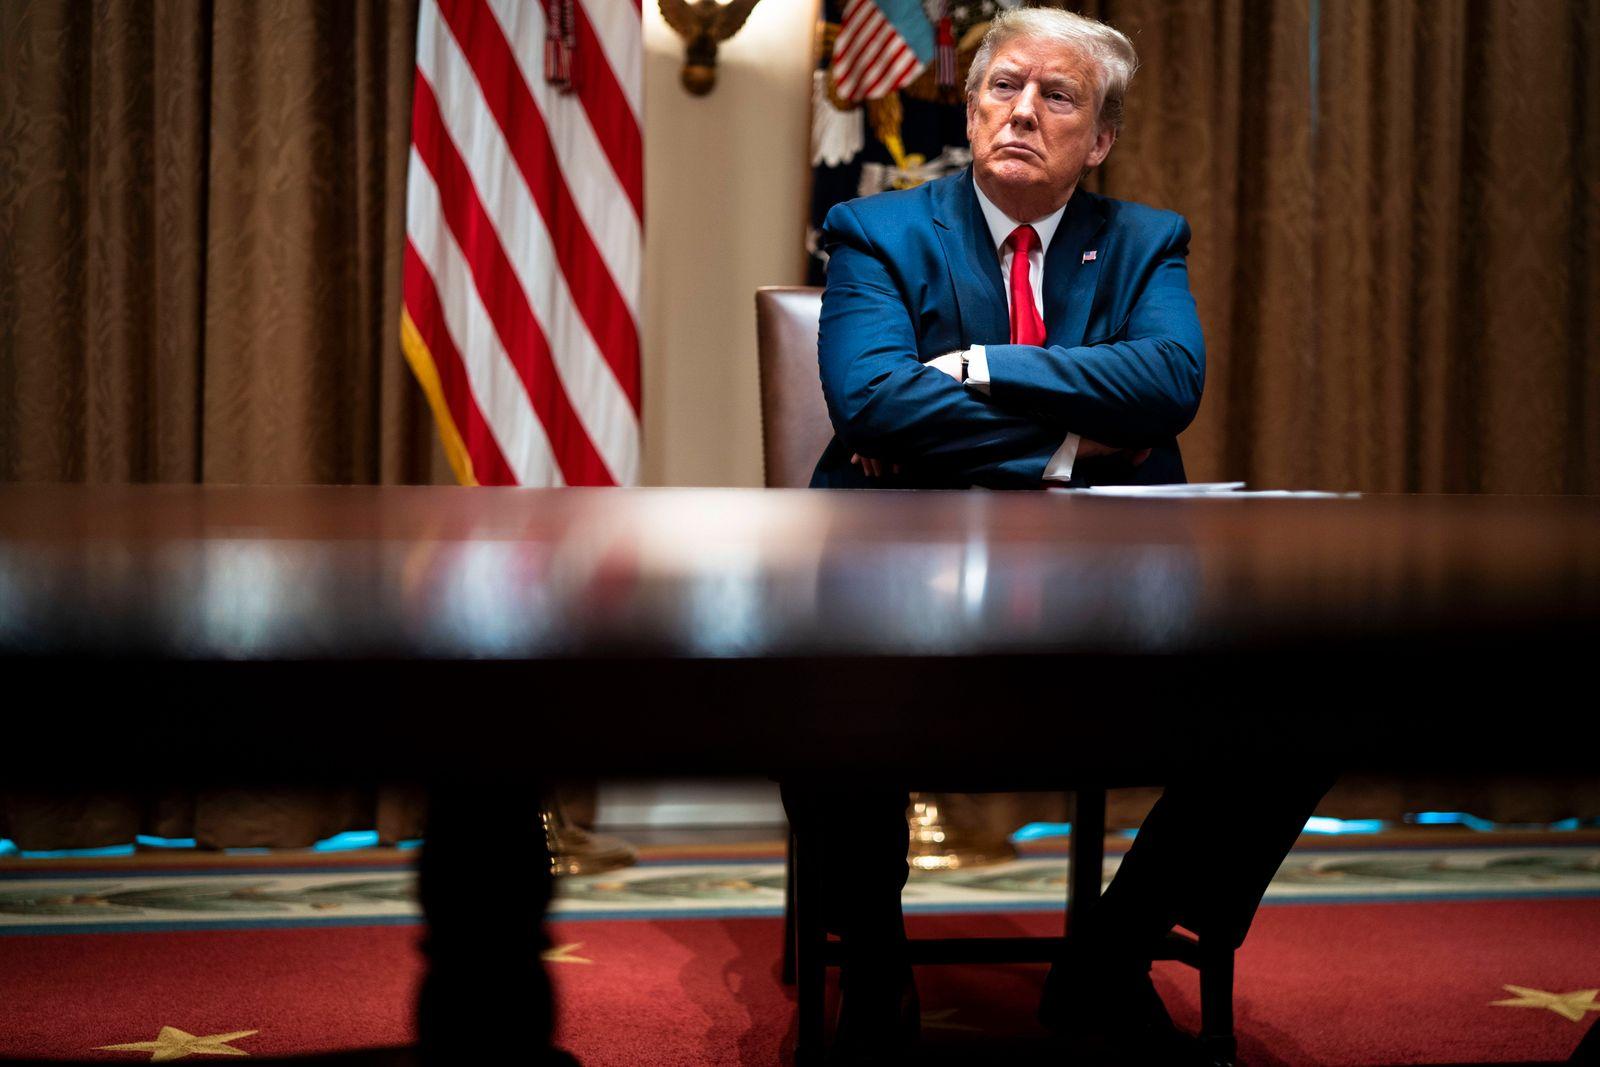 News Bilder des Tages April 14, 2020, Washington, District of Columbia, USA: United States President Donald J. Trump mak